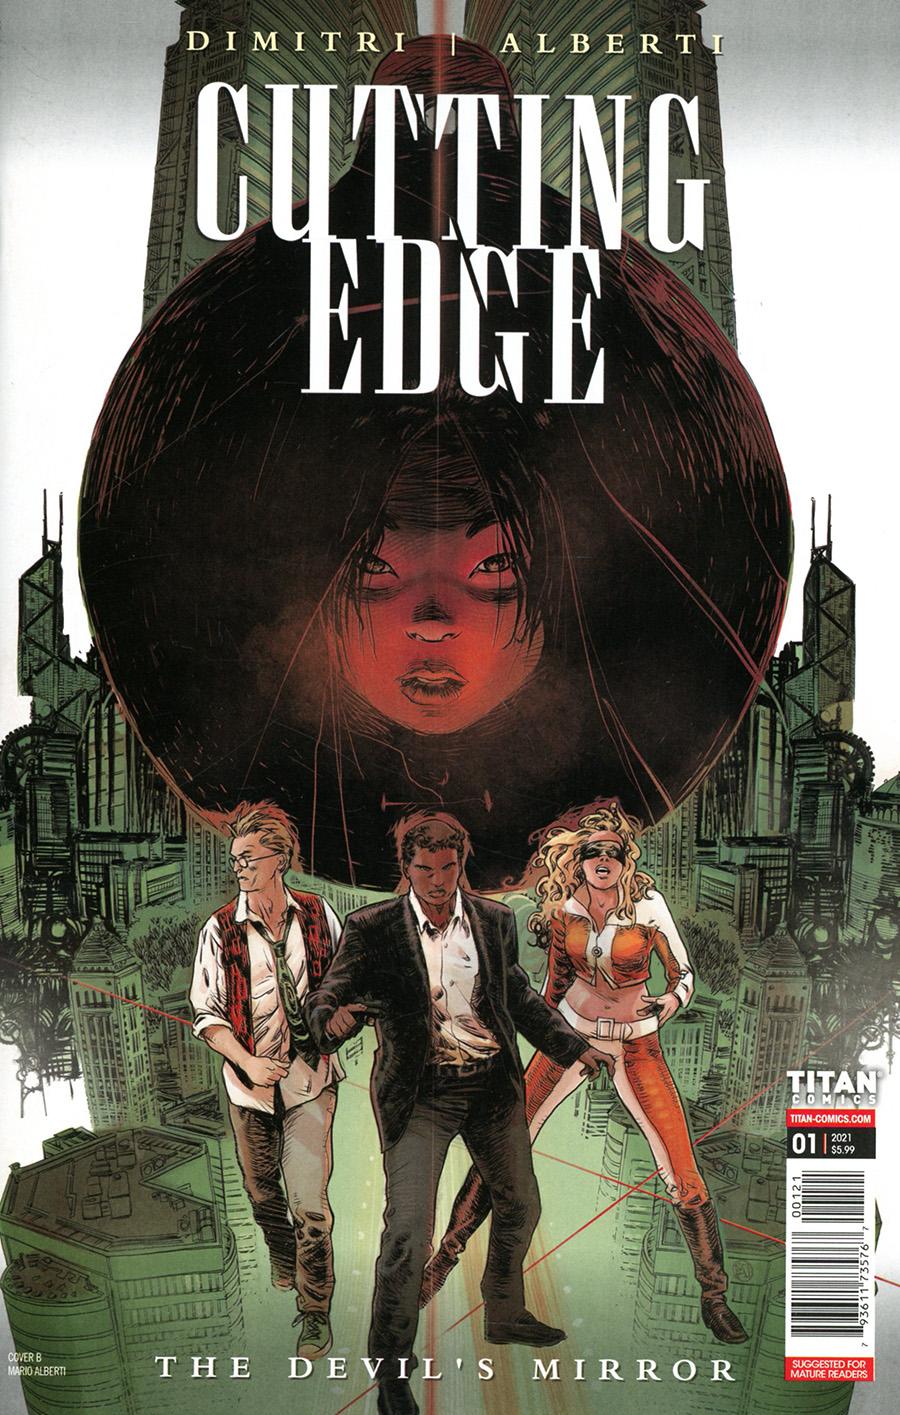 Cutting Edge Devils Mirror #1 Cover B Variant Mario Alberti Cover